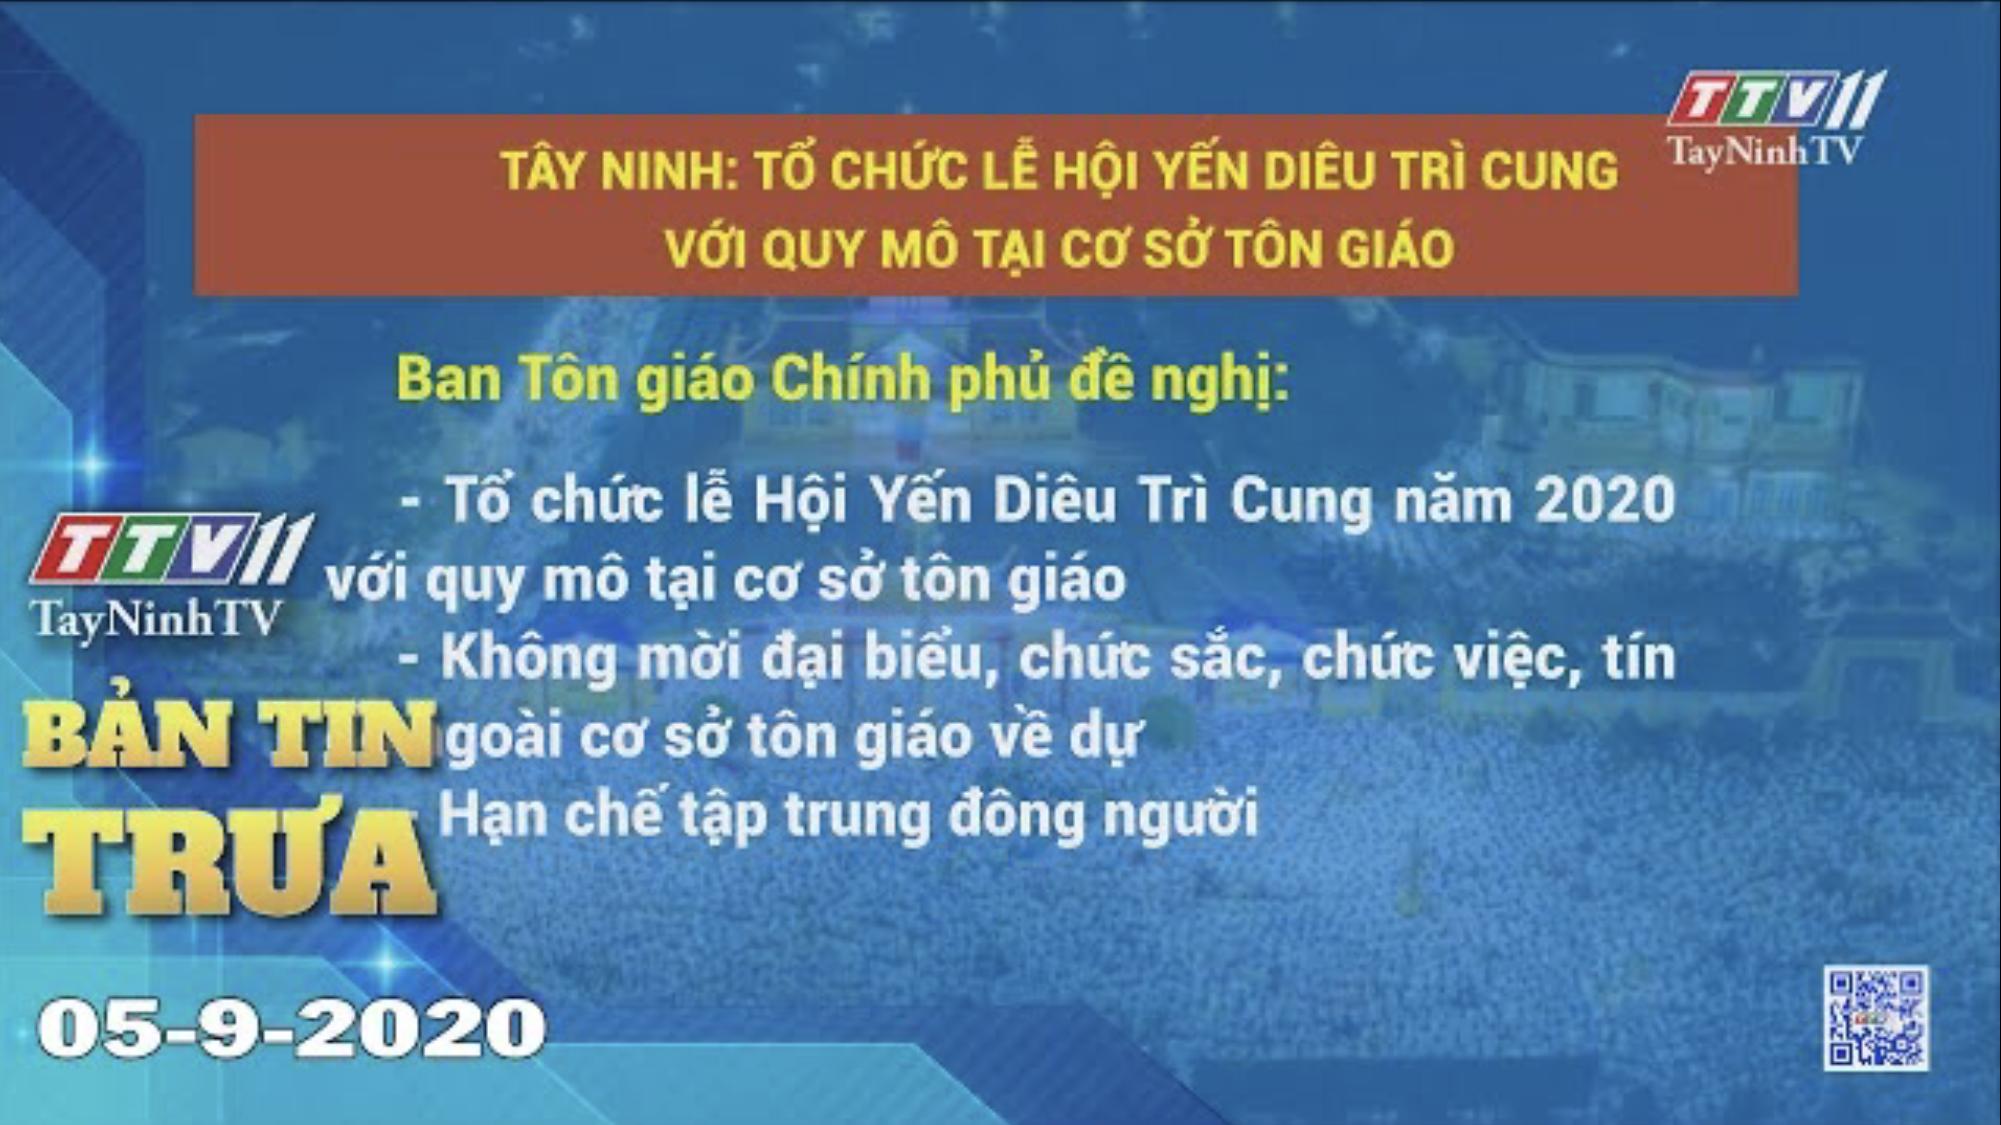 Bản tin trưa 05-9-2020 | Tin tức hôm nay | TayNinhTV